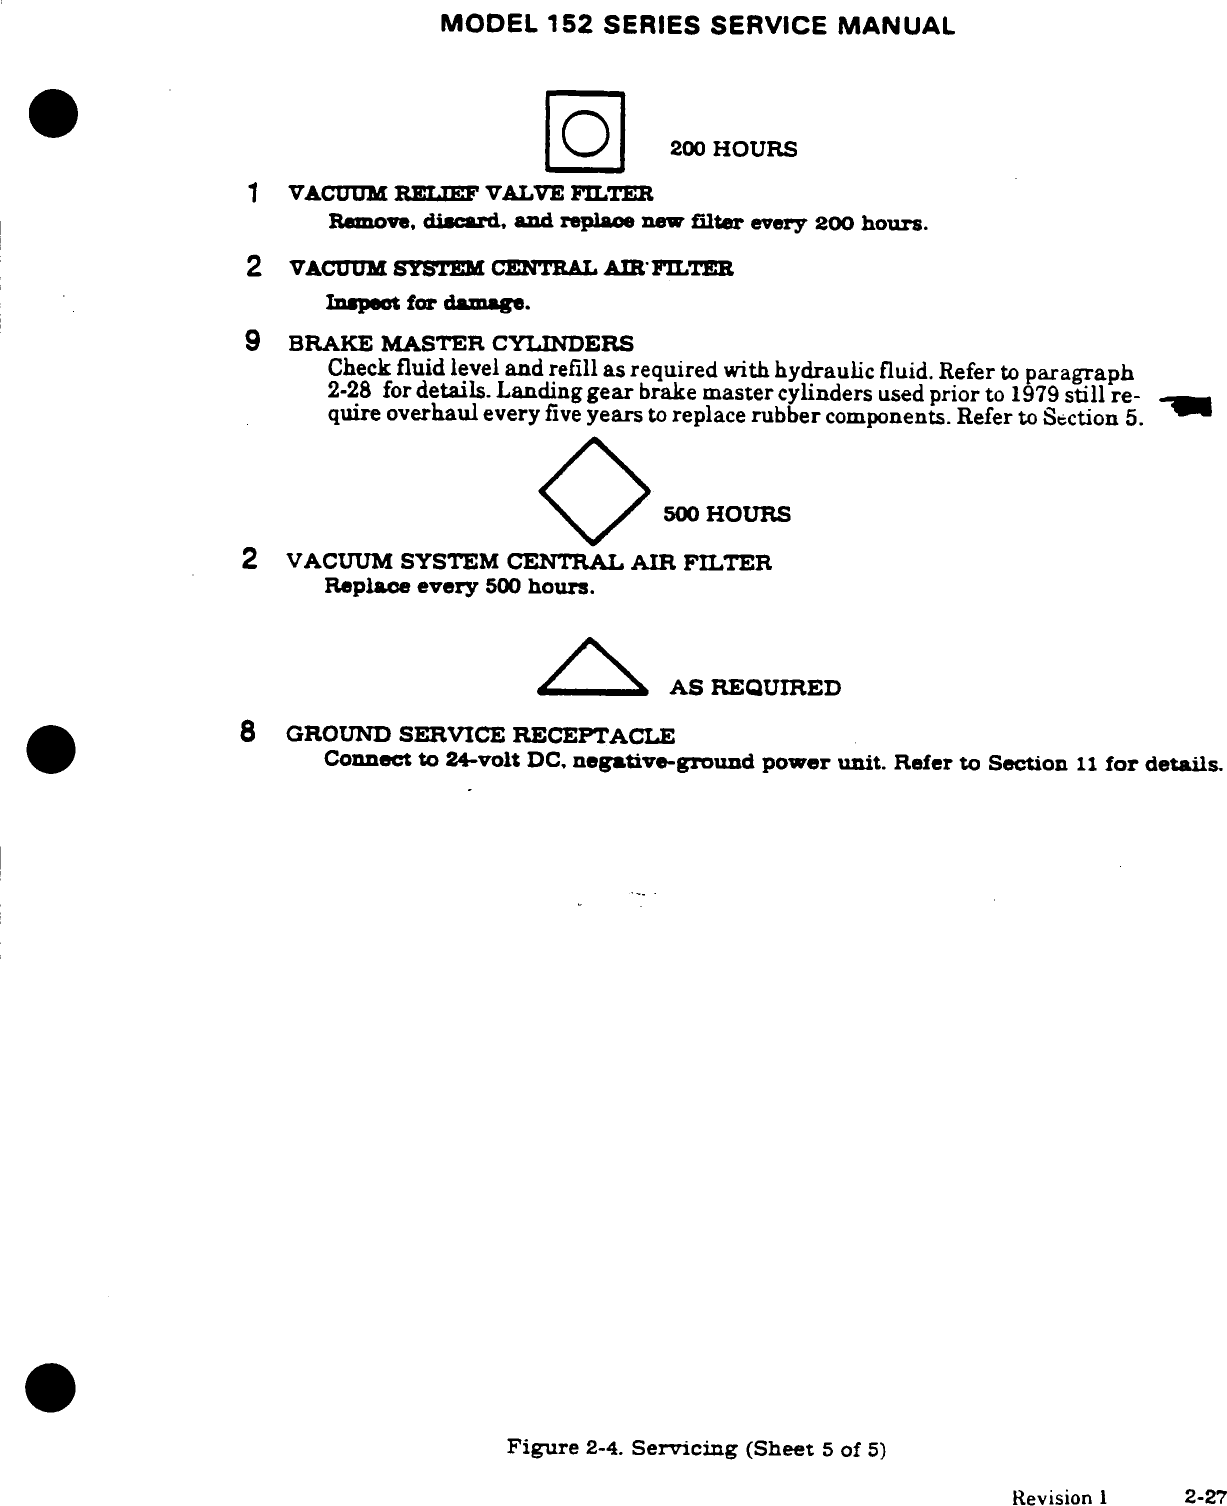 1981 Replacement Copper Exhaust Gasket 2J4 SR 500